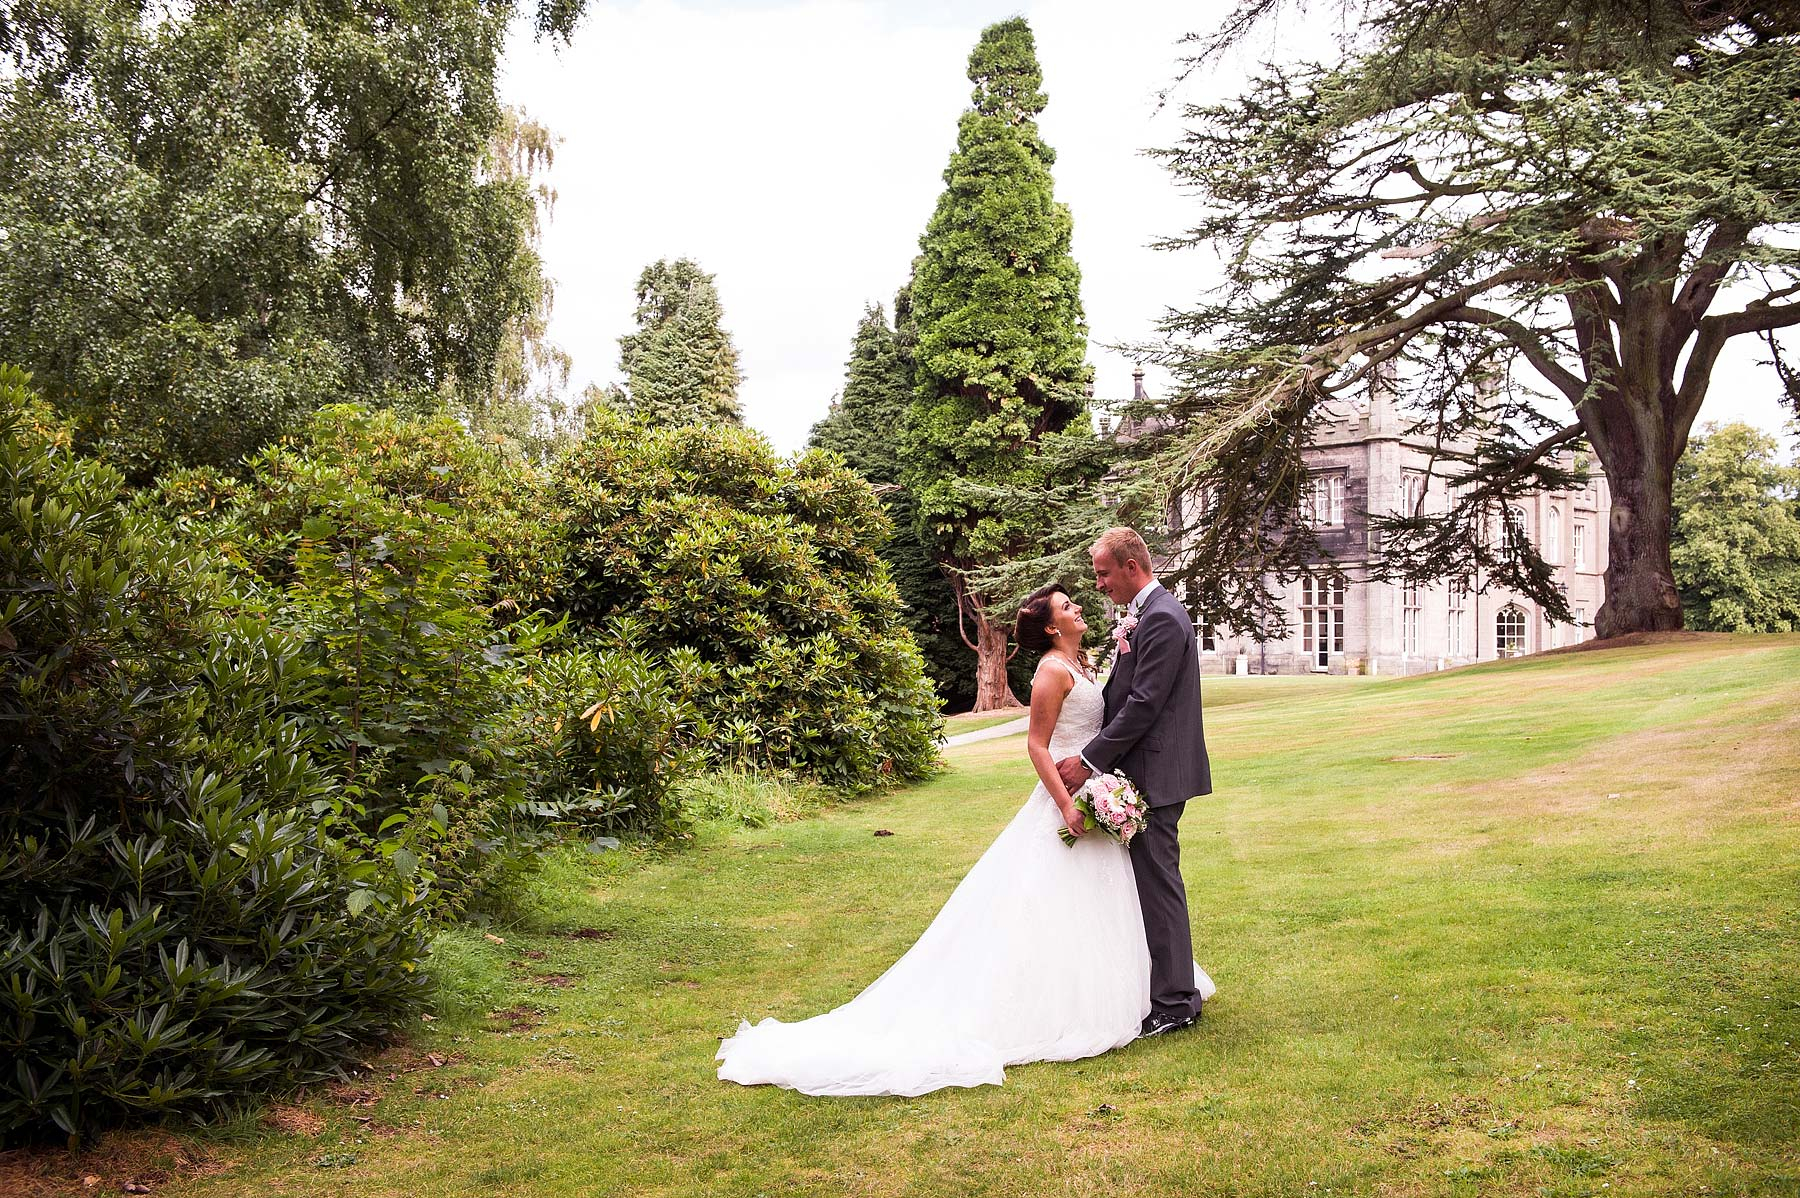 hawkesyard-estate-wedding-photographers-rugeley-001